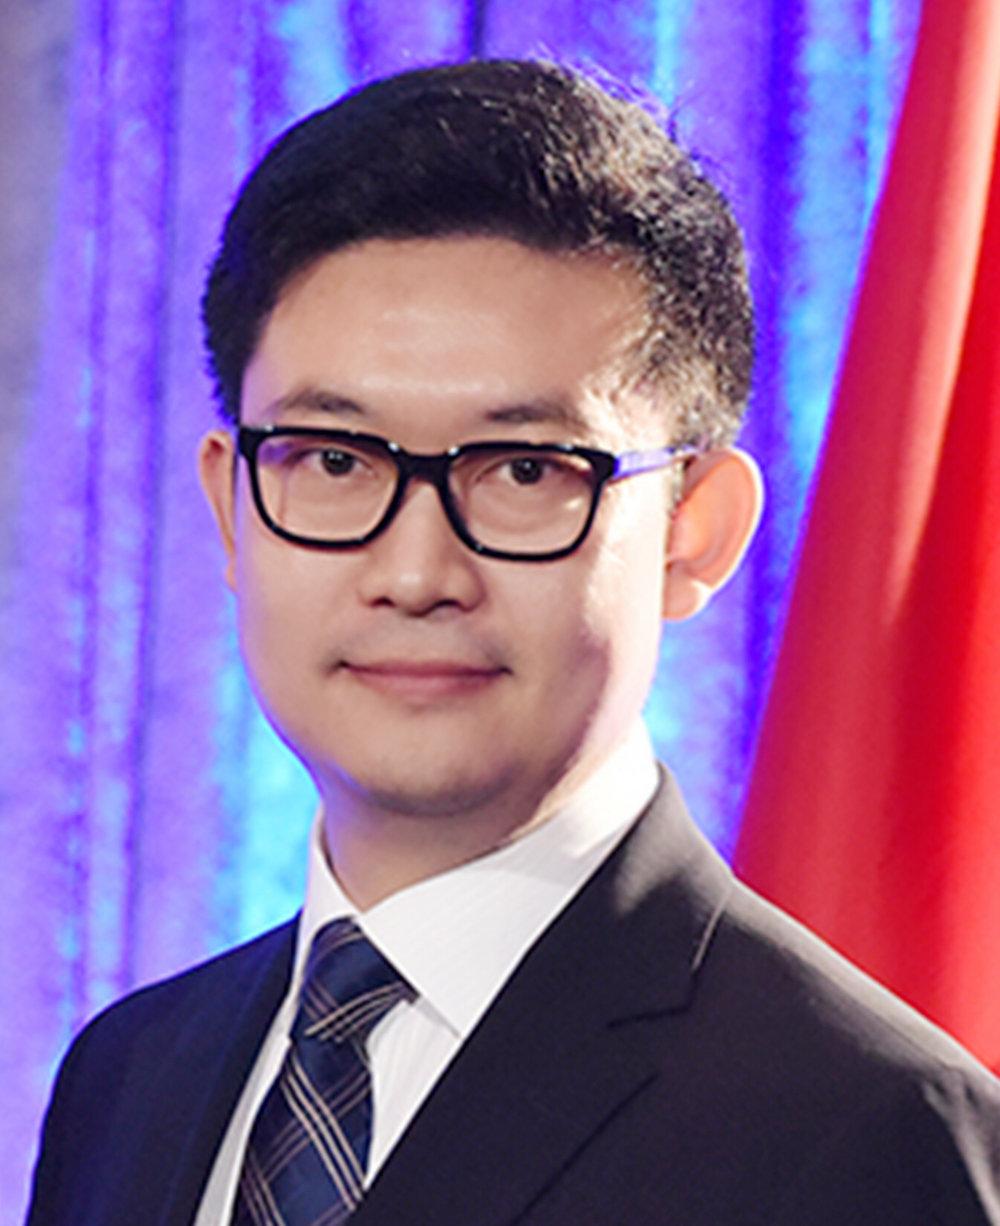 Wei Zhang - Principal InvestigatorB.Sc. Beijing Normal UniversityPh.D. Mount Sinai Hospital/University of TorontoPostdoc. The Donnelly Centre, University of TorontoGoogle Scholar profile